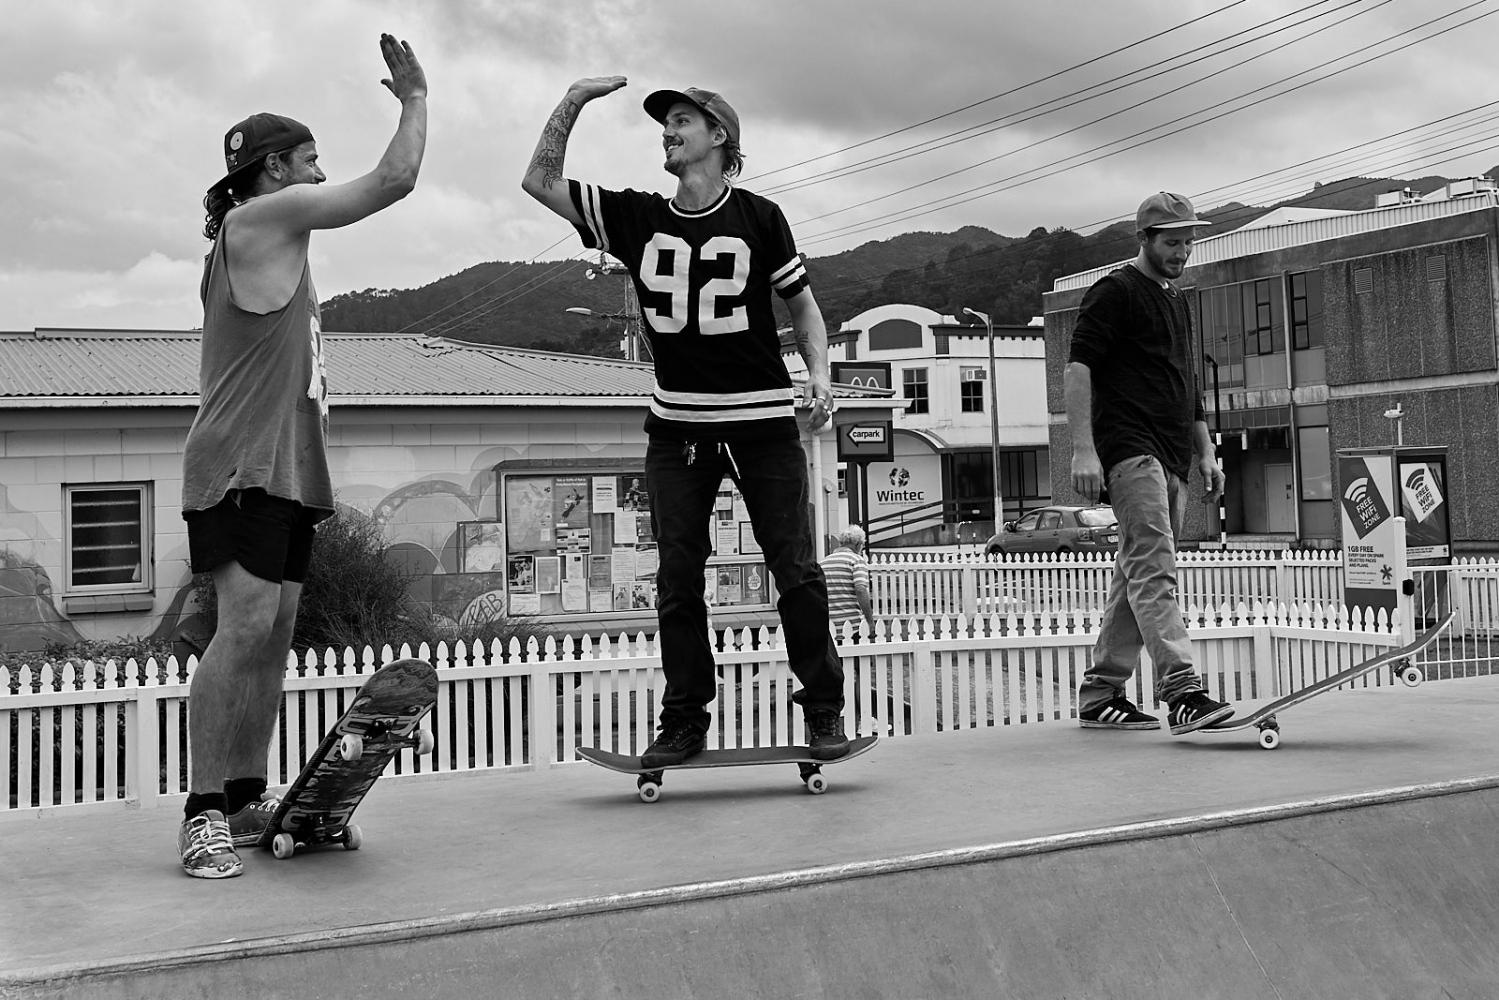 Photography image - Loading skate_culture70.jpg